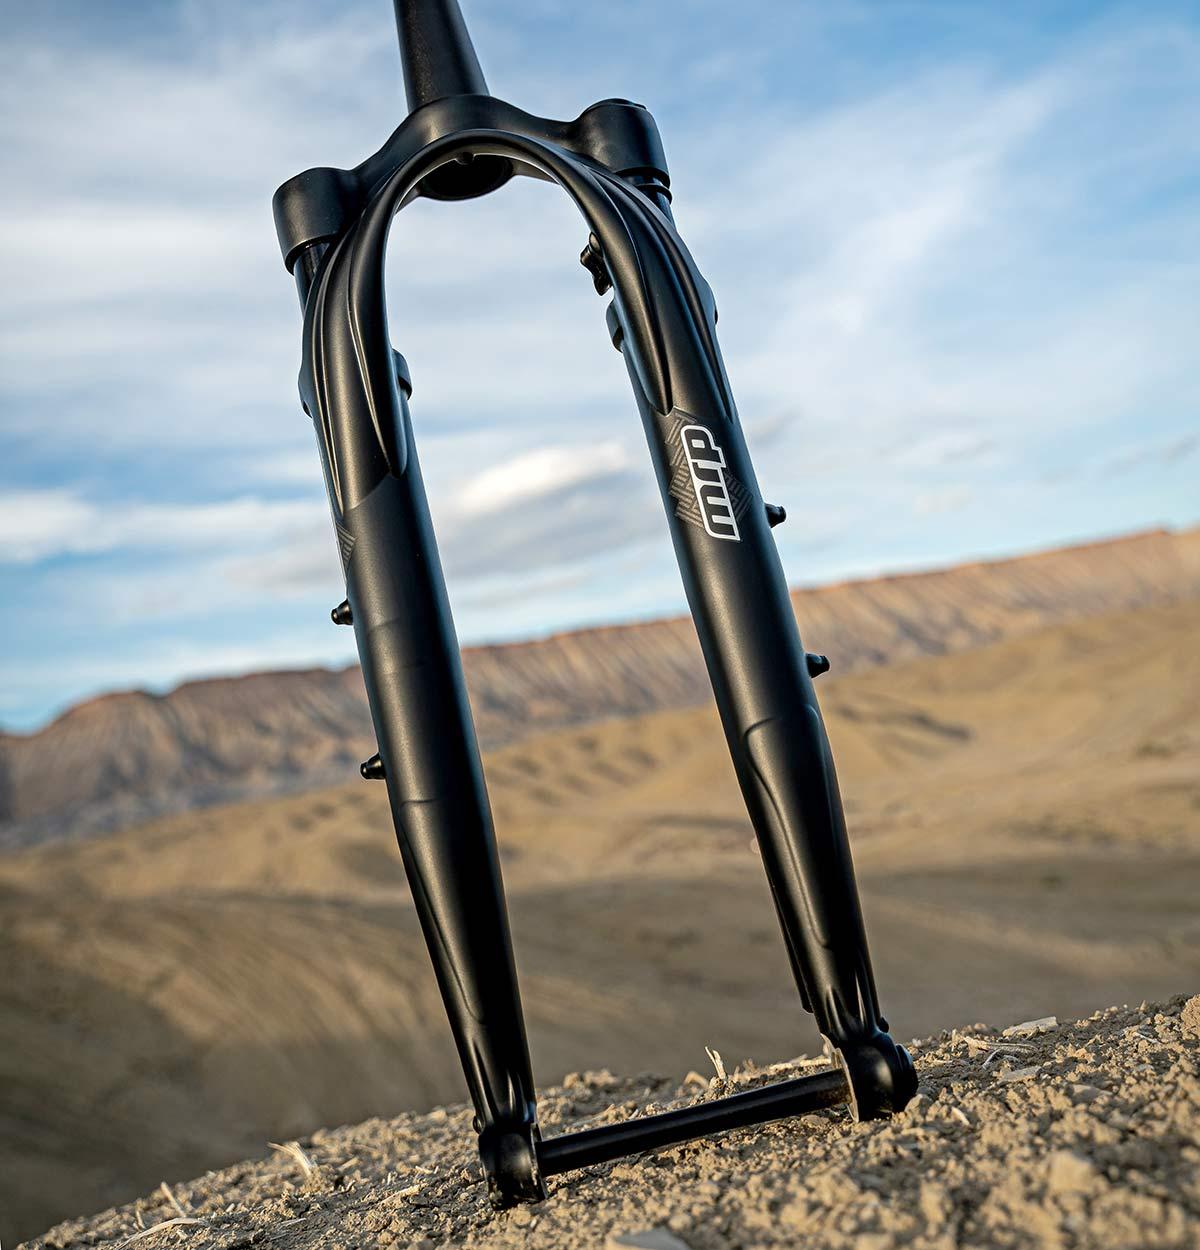 All-new MRP Baxter gravel fork, lightweight 40mm 60mm gravel bike-specific suspension,front